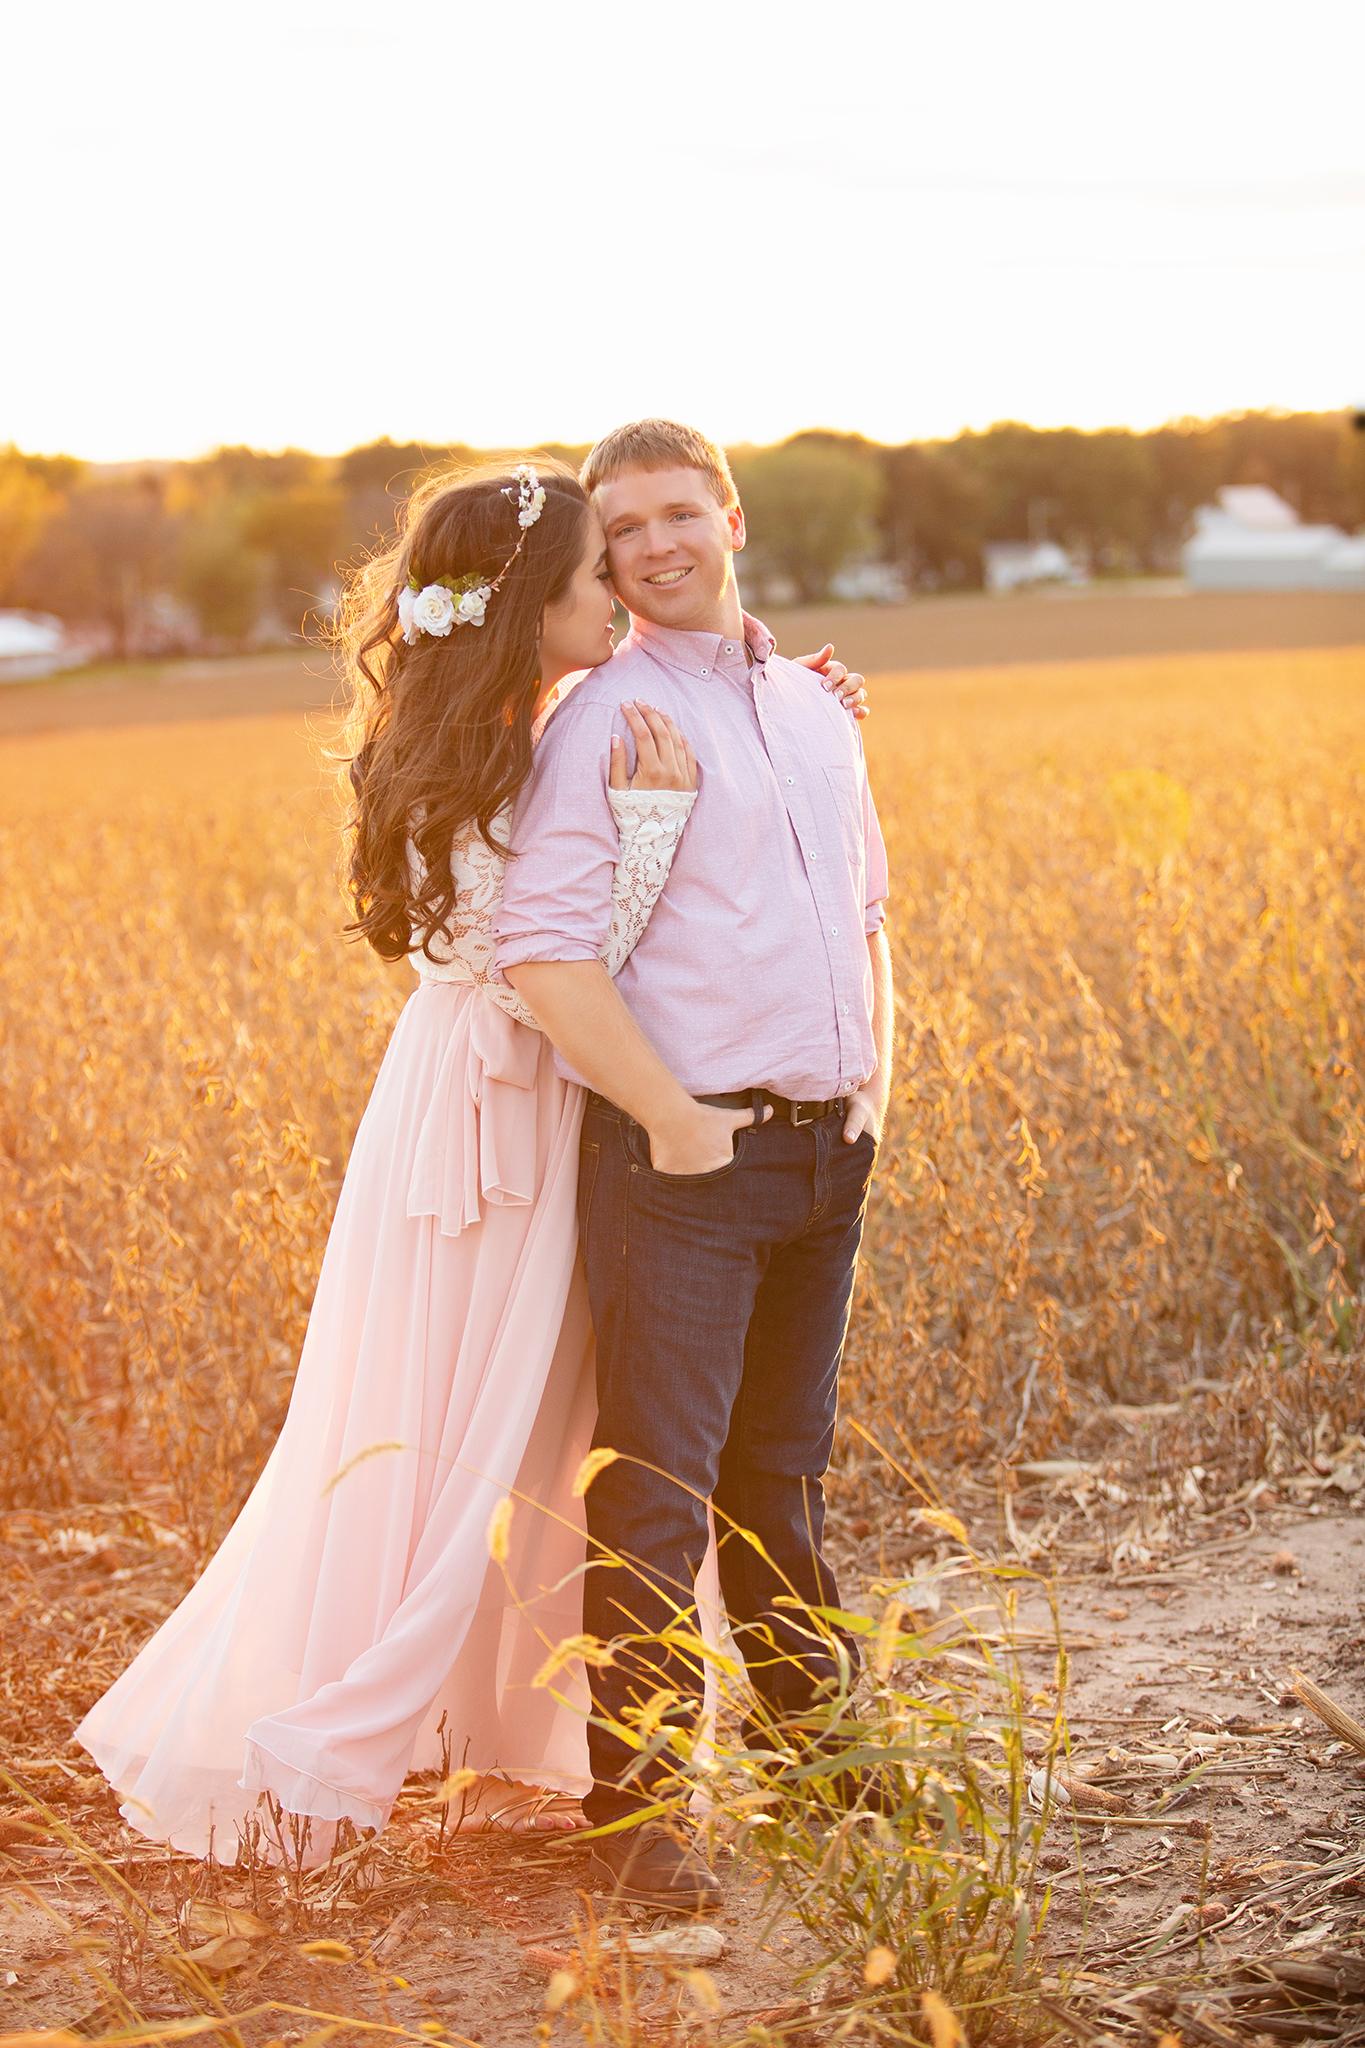 lehia erger photography engagement  wedding brandon iowa country.jpg